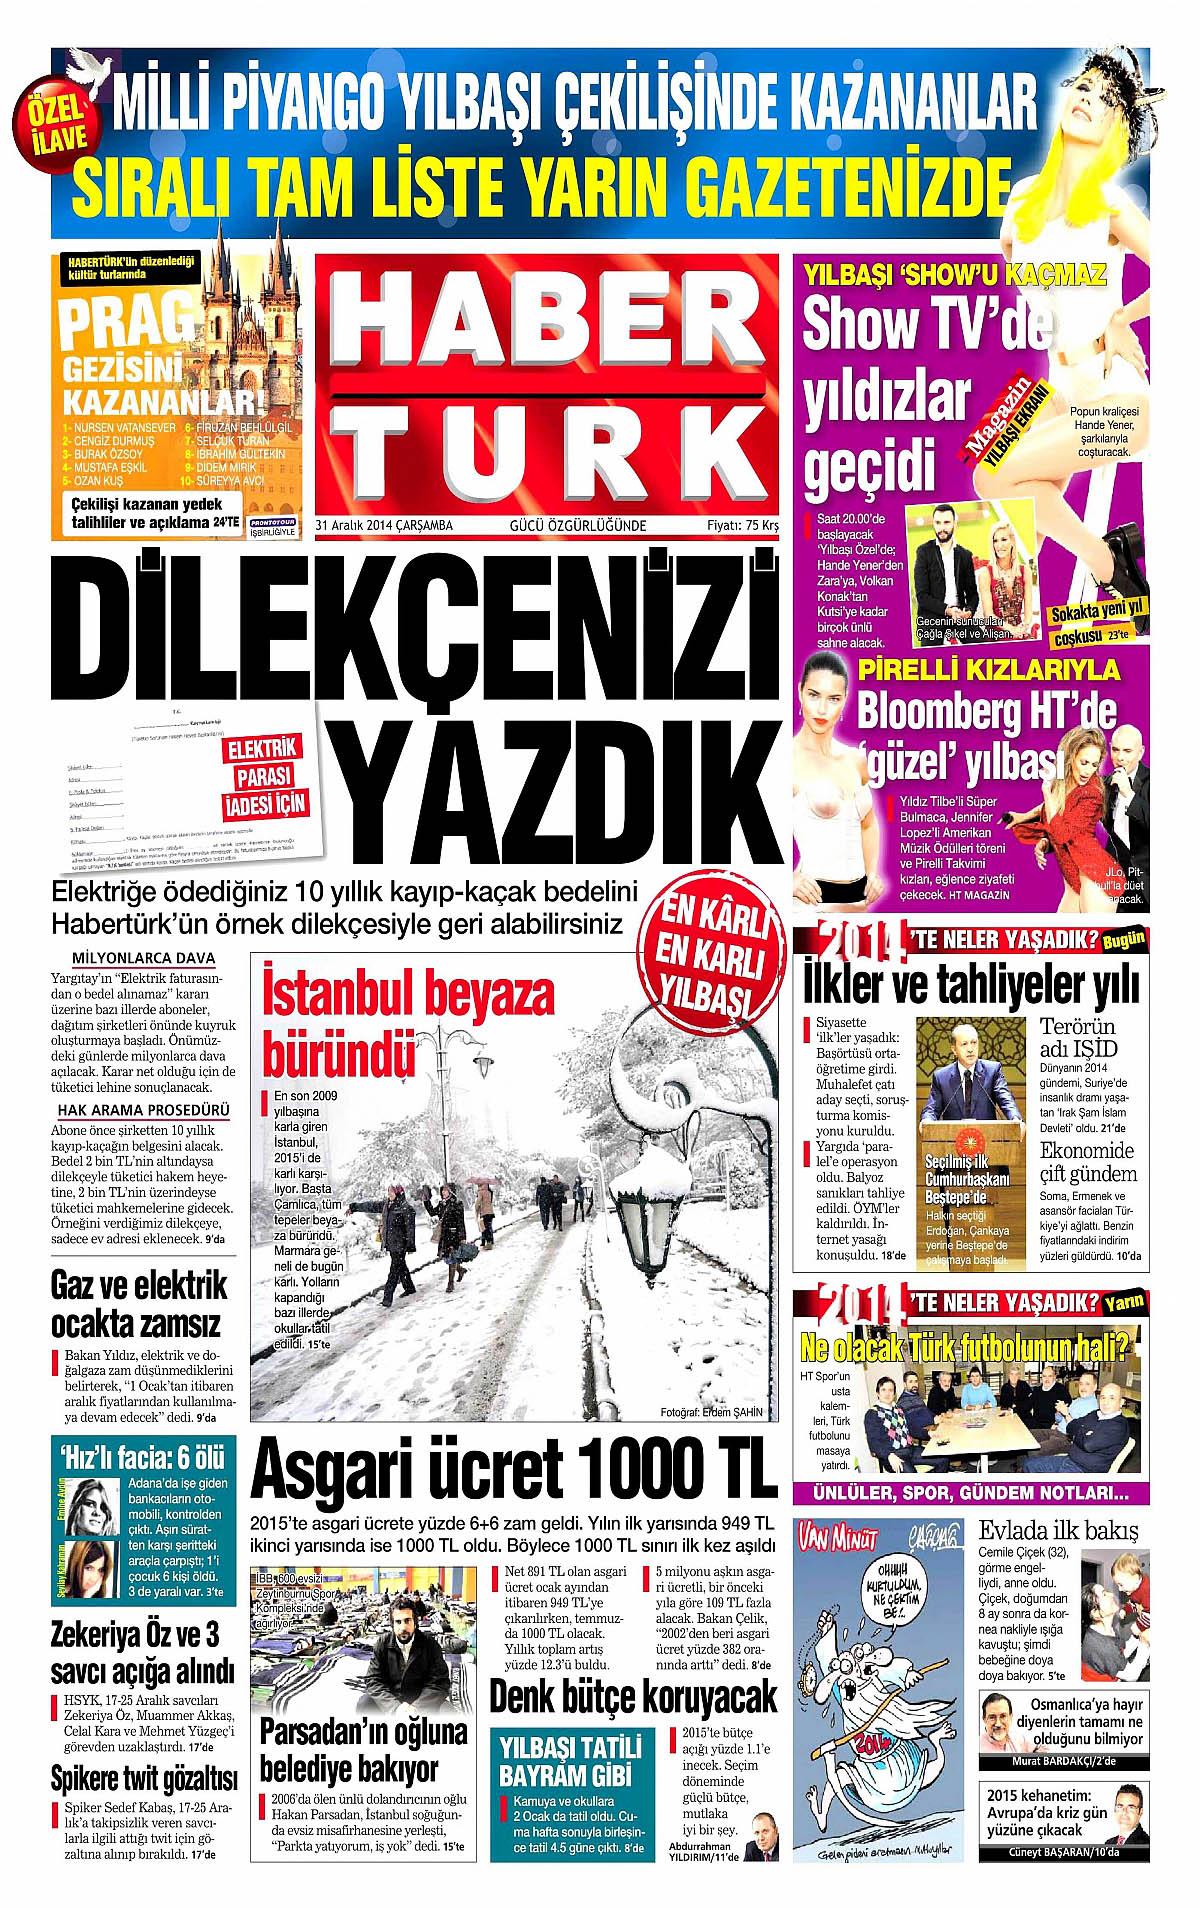 haberturk-gazetesi_81950